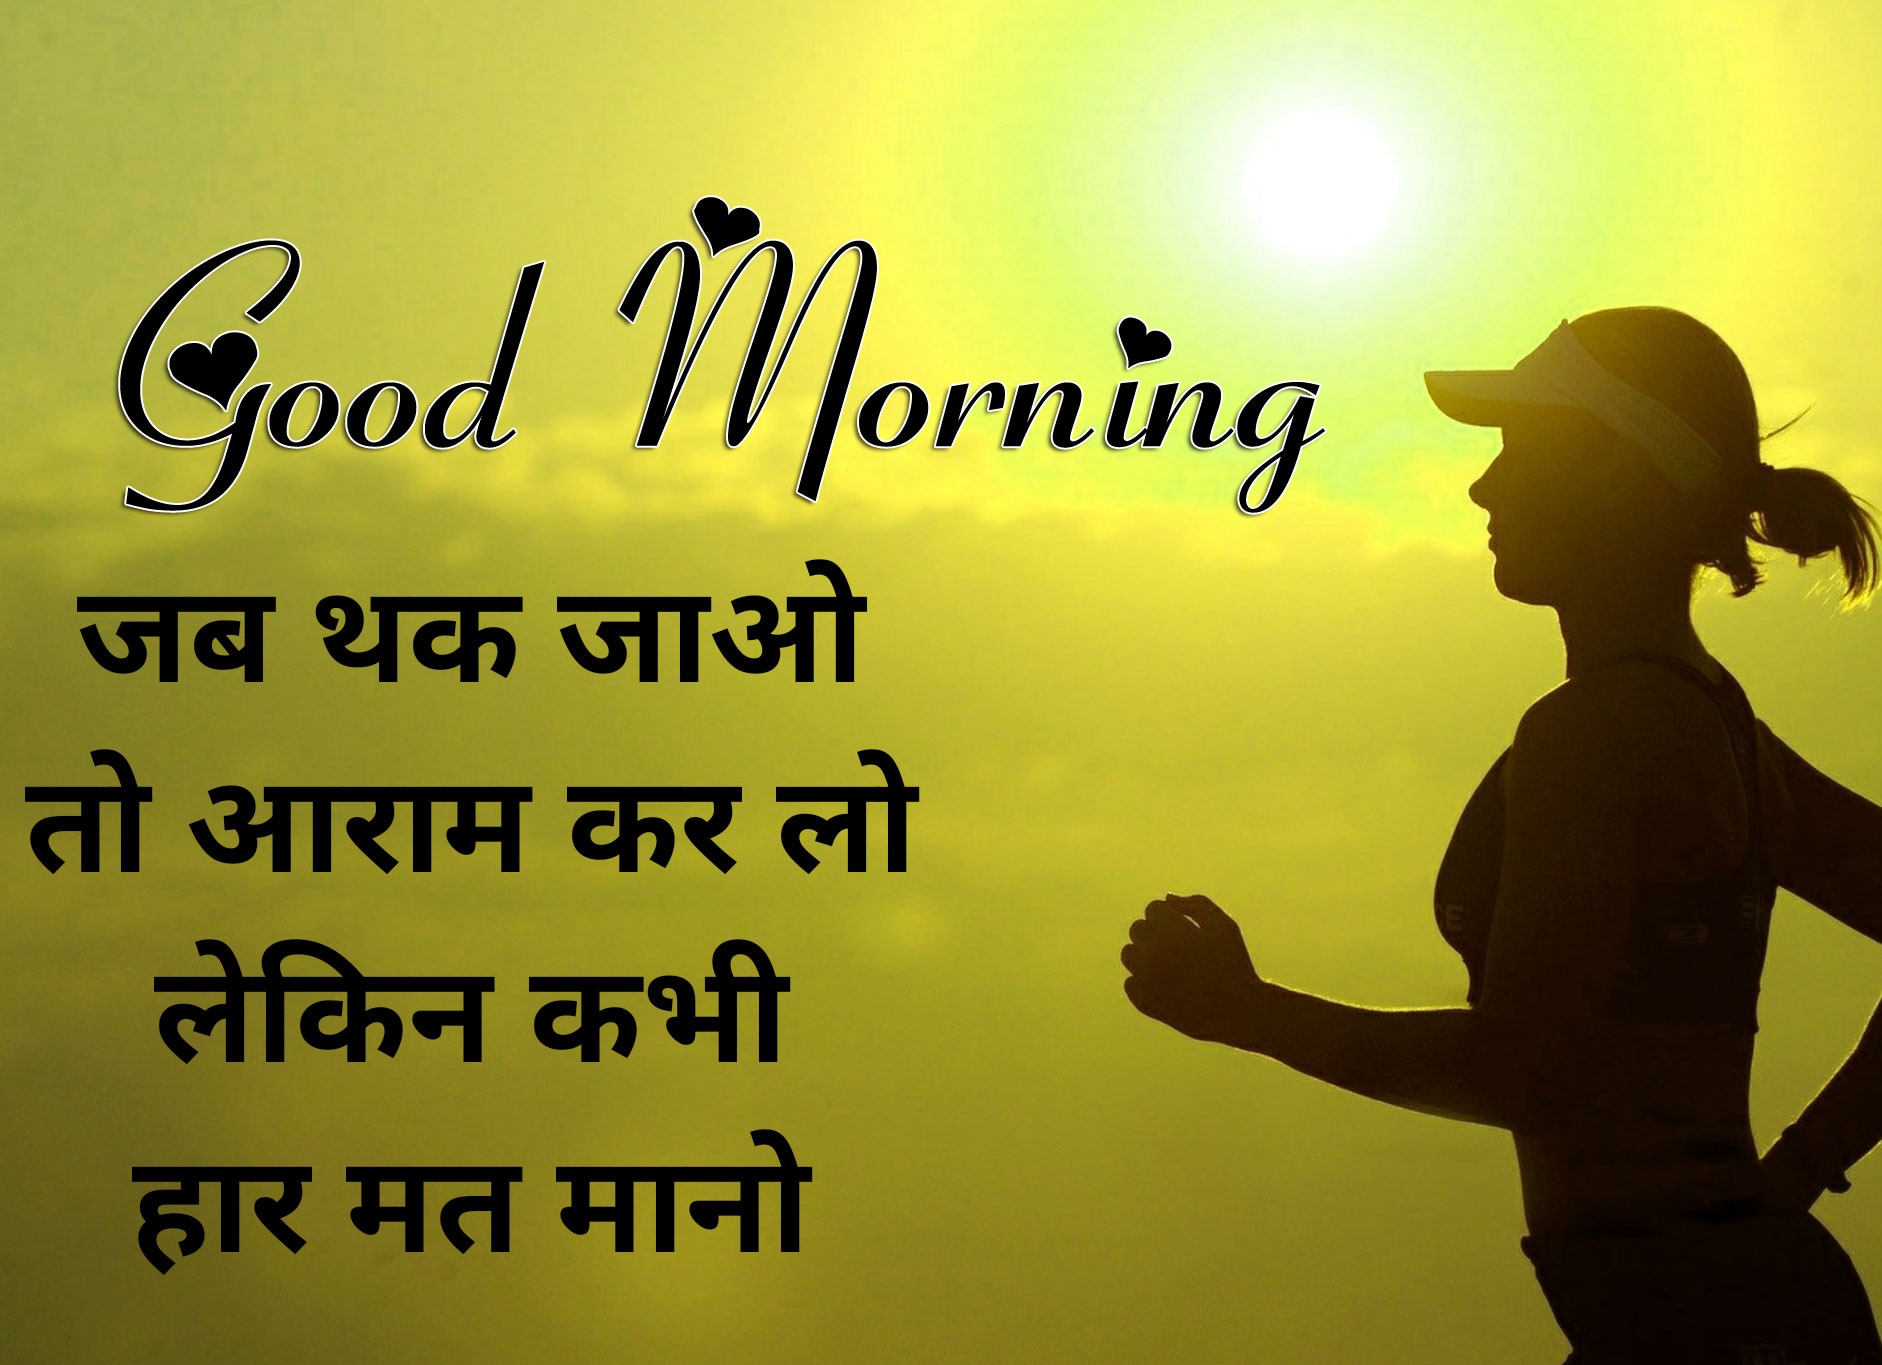 For Friend 1080p Shayari good Morning Images Pics Download